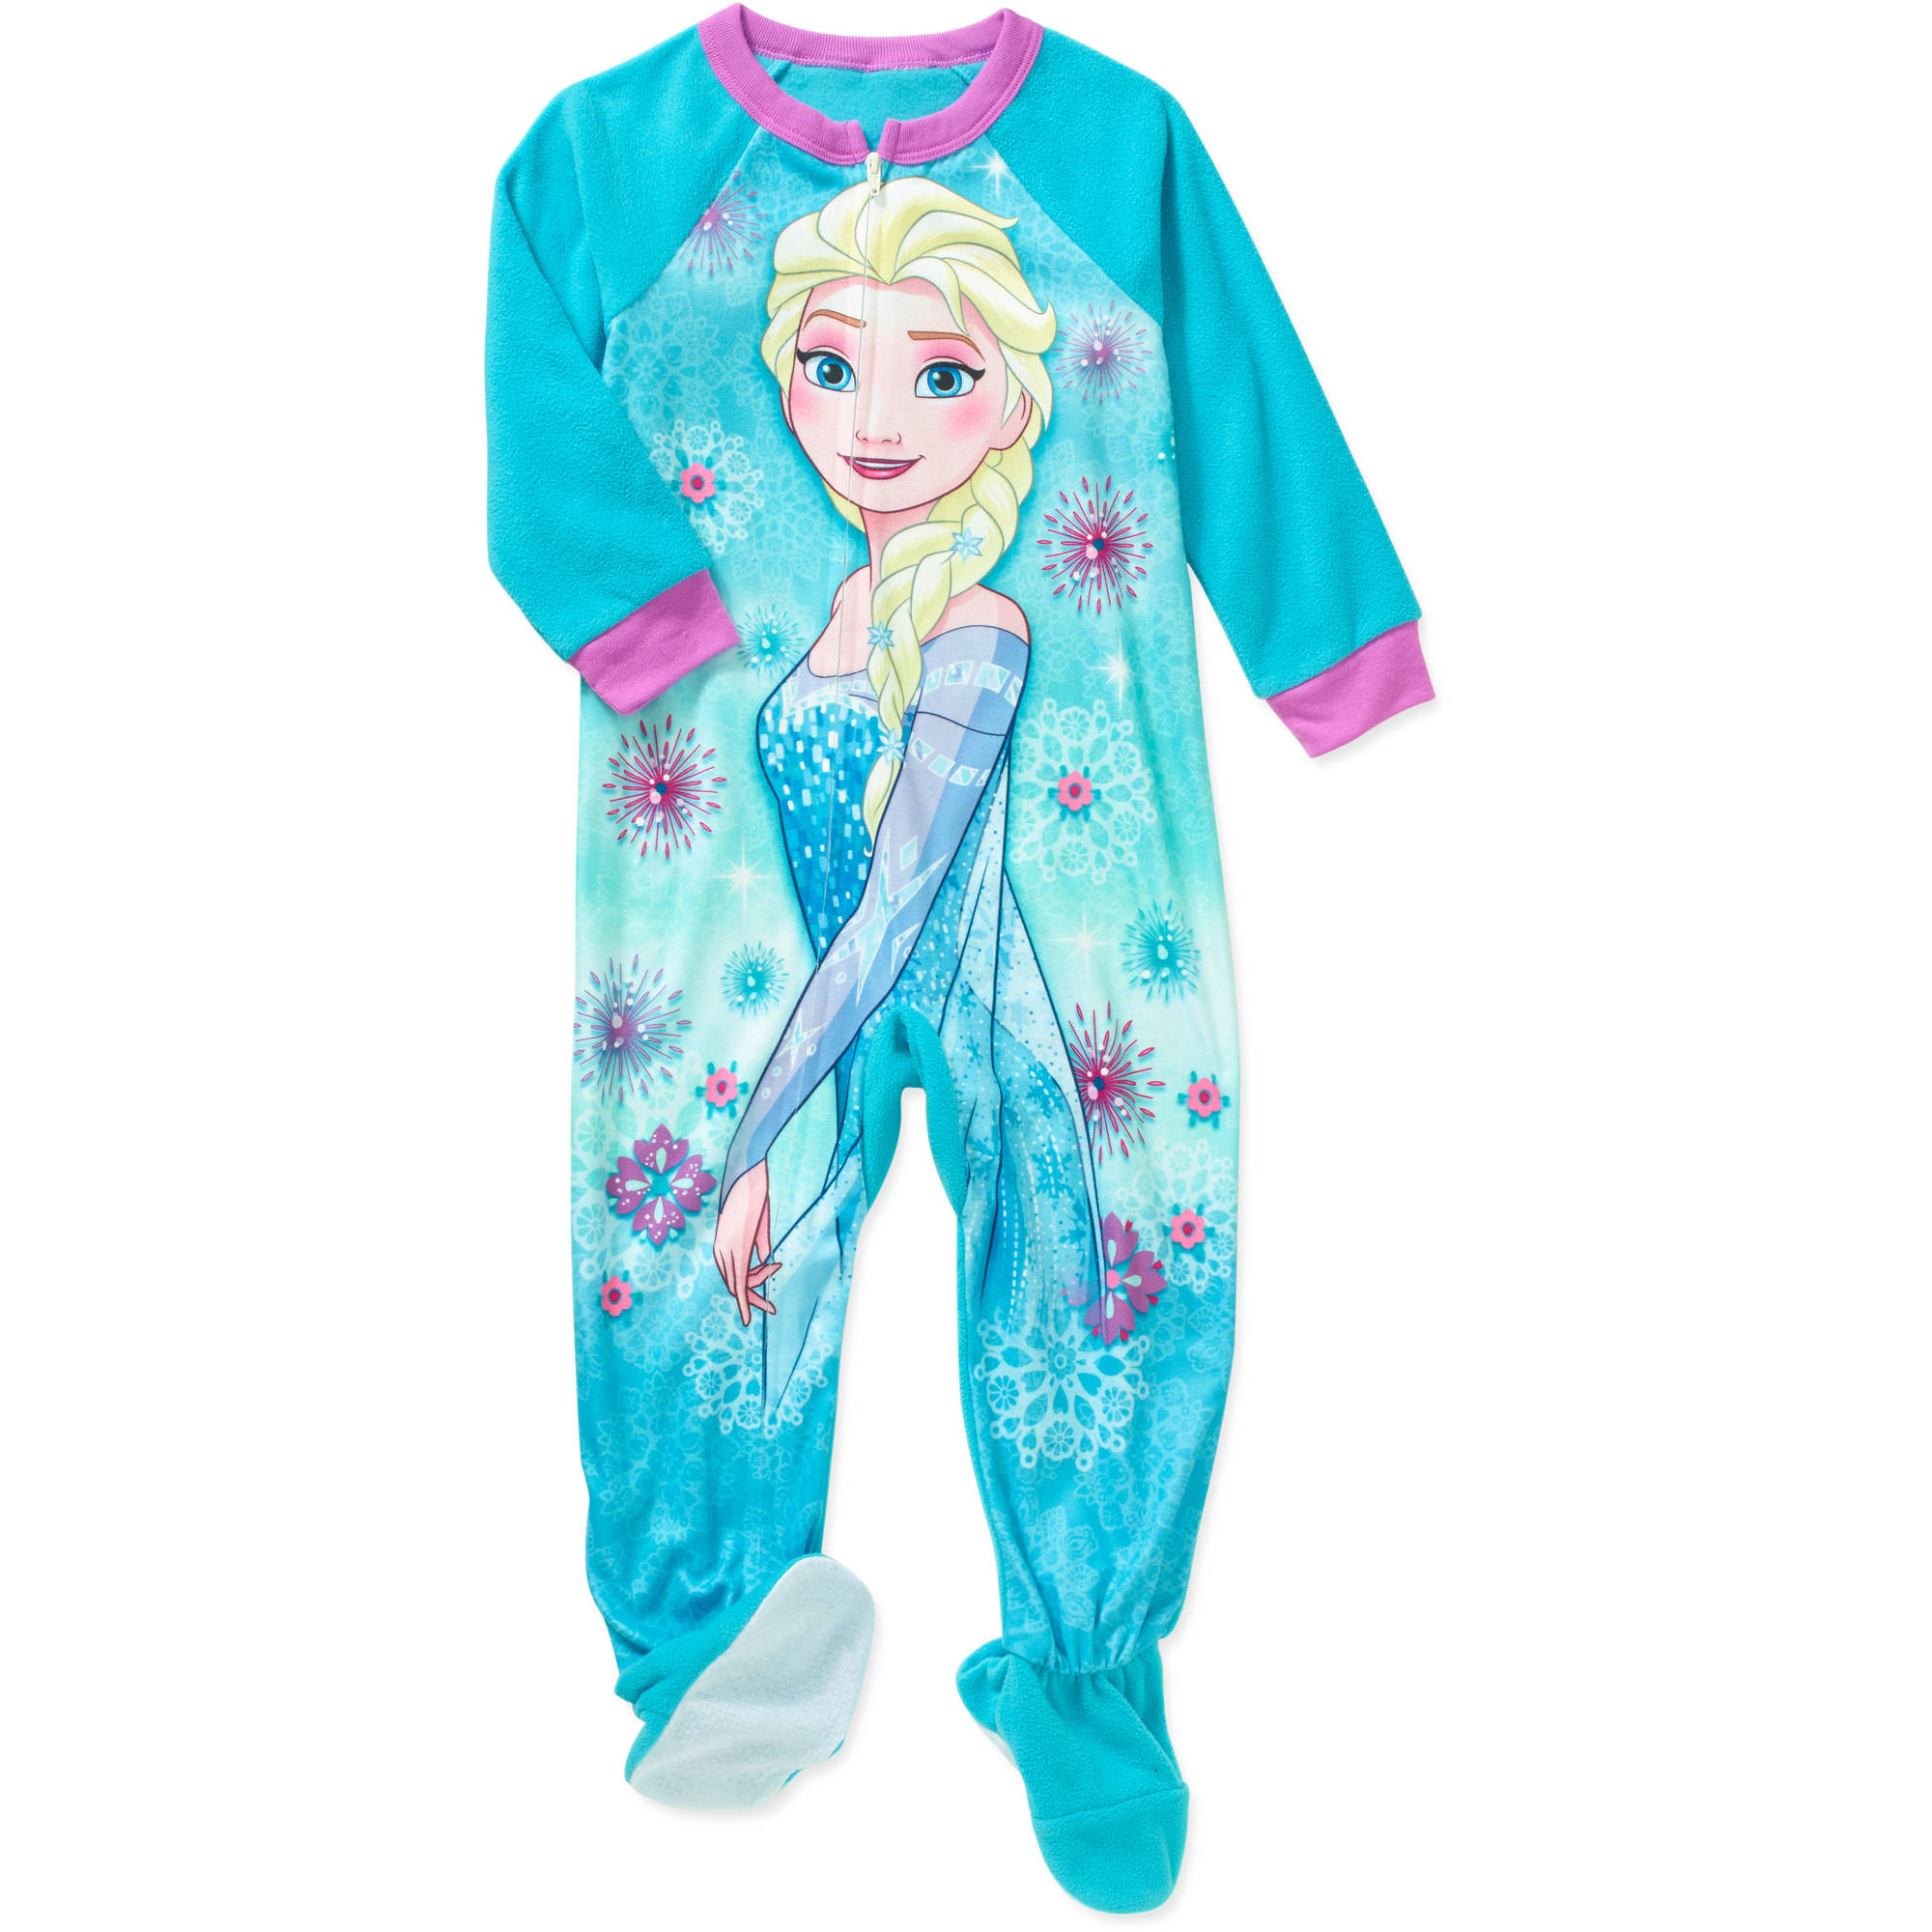 Disney Frozen Toddler Girls' Micro Fleece Footed PJ